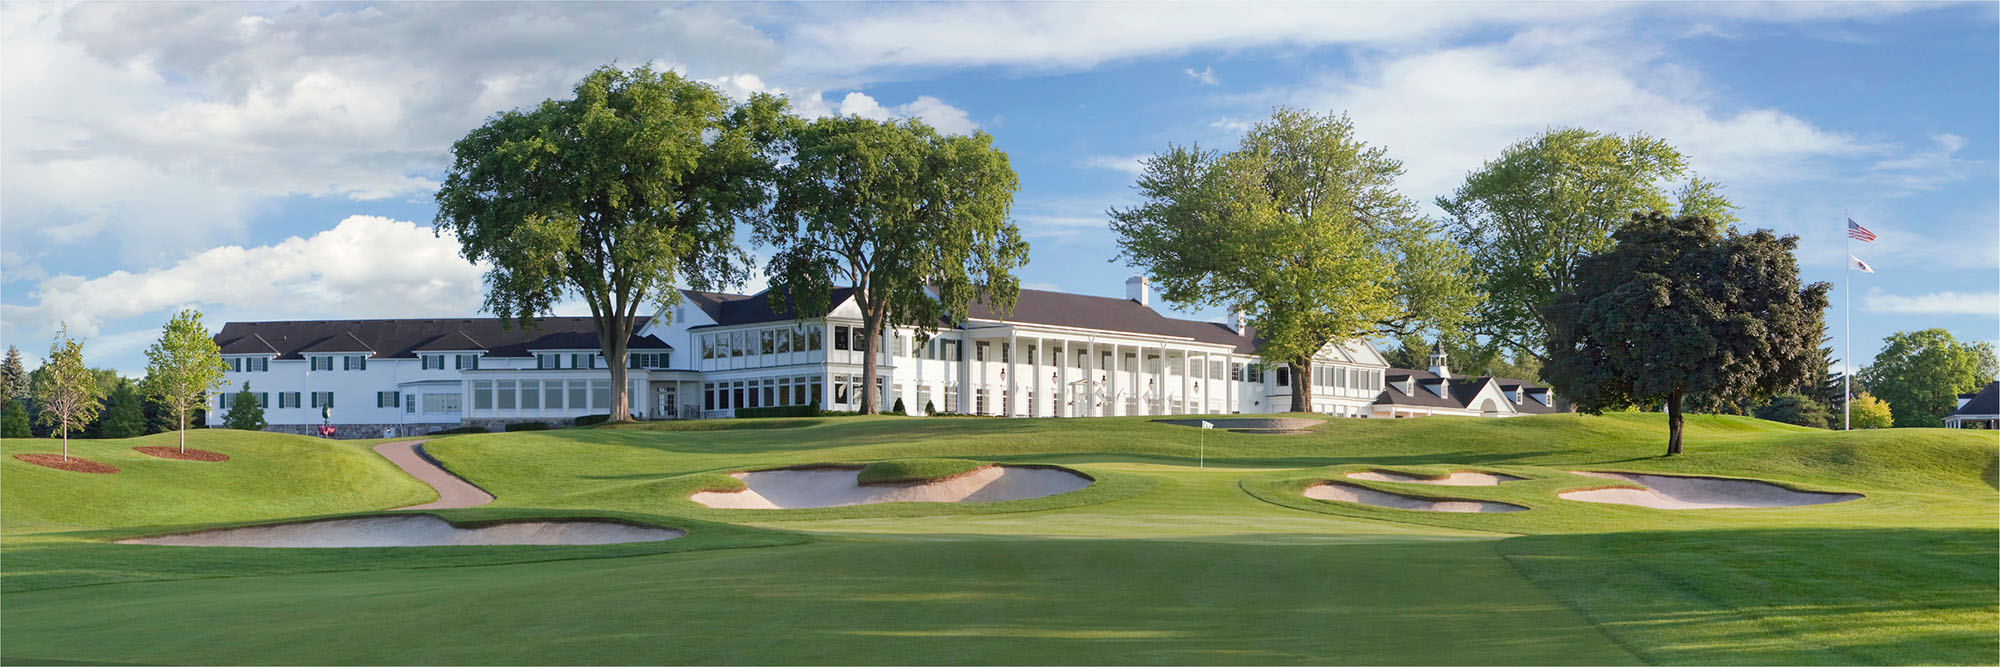 Golf Course Image - Oakland Hills No. 18